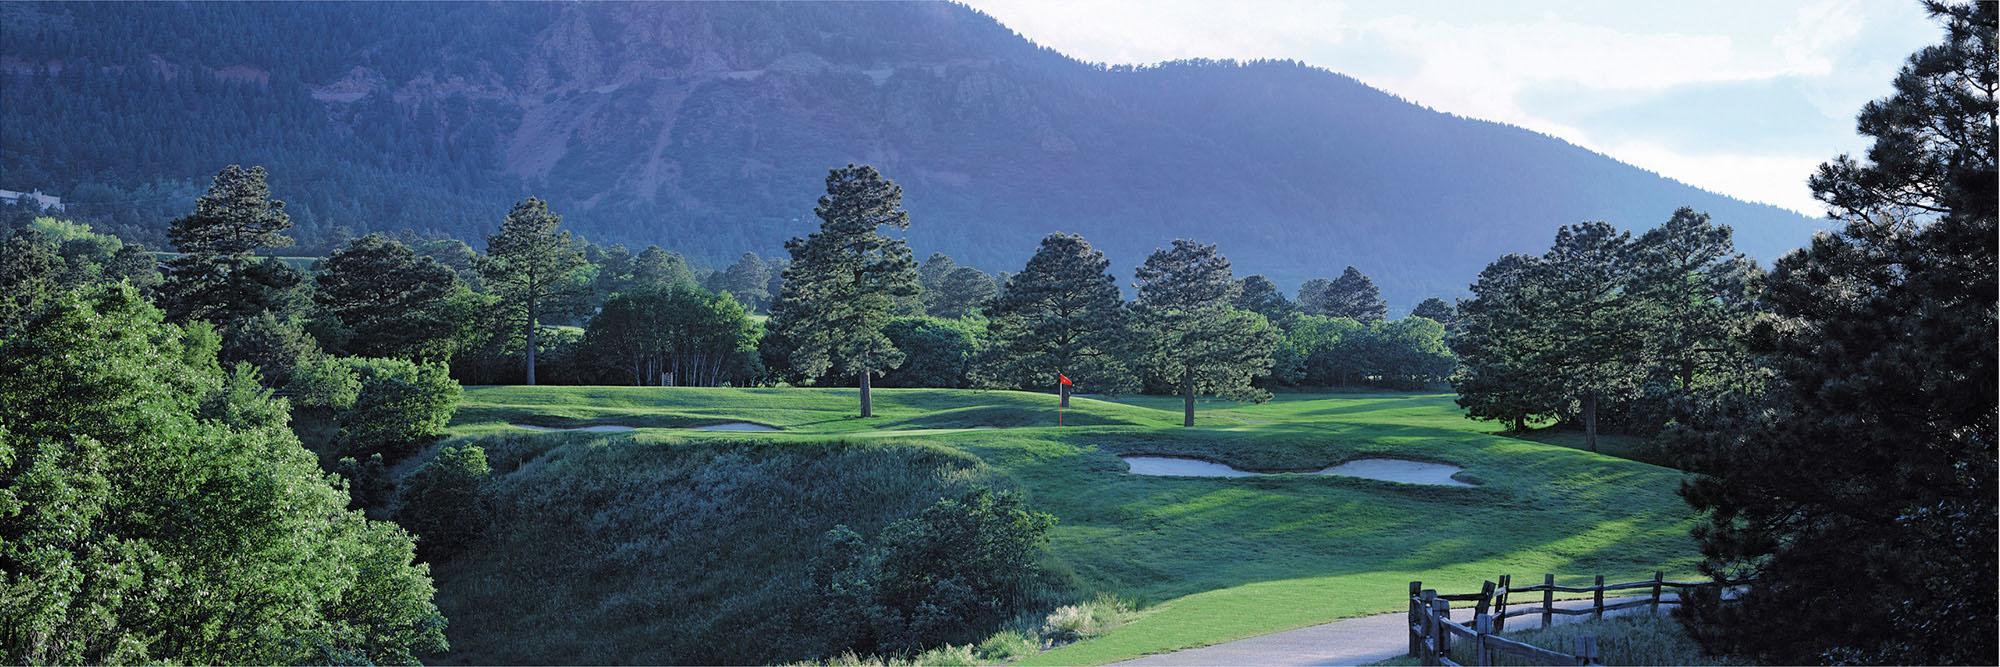 Golf Course Image - Broadmoor East No. 8